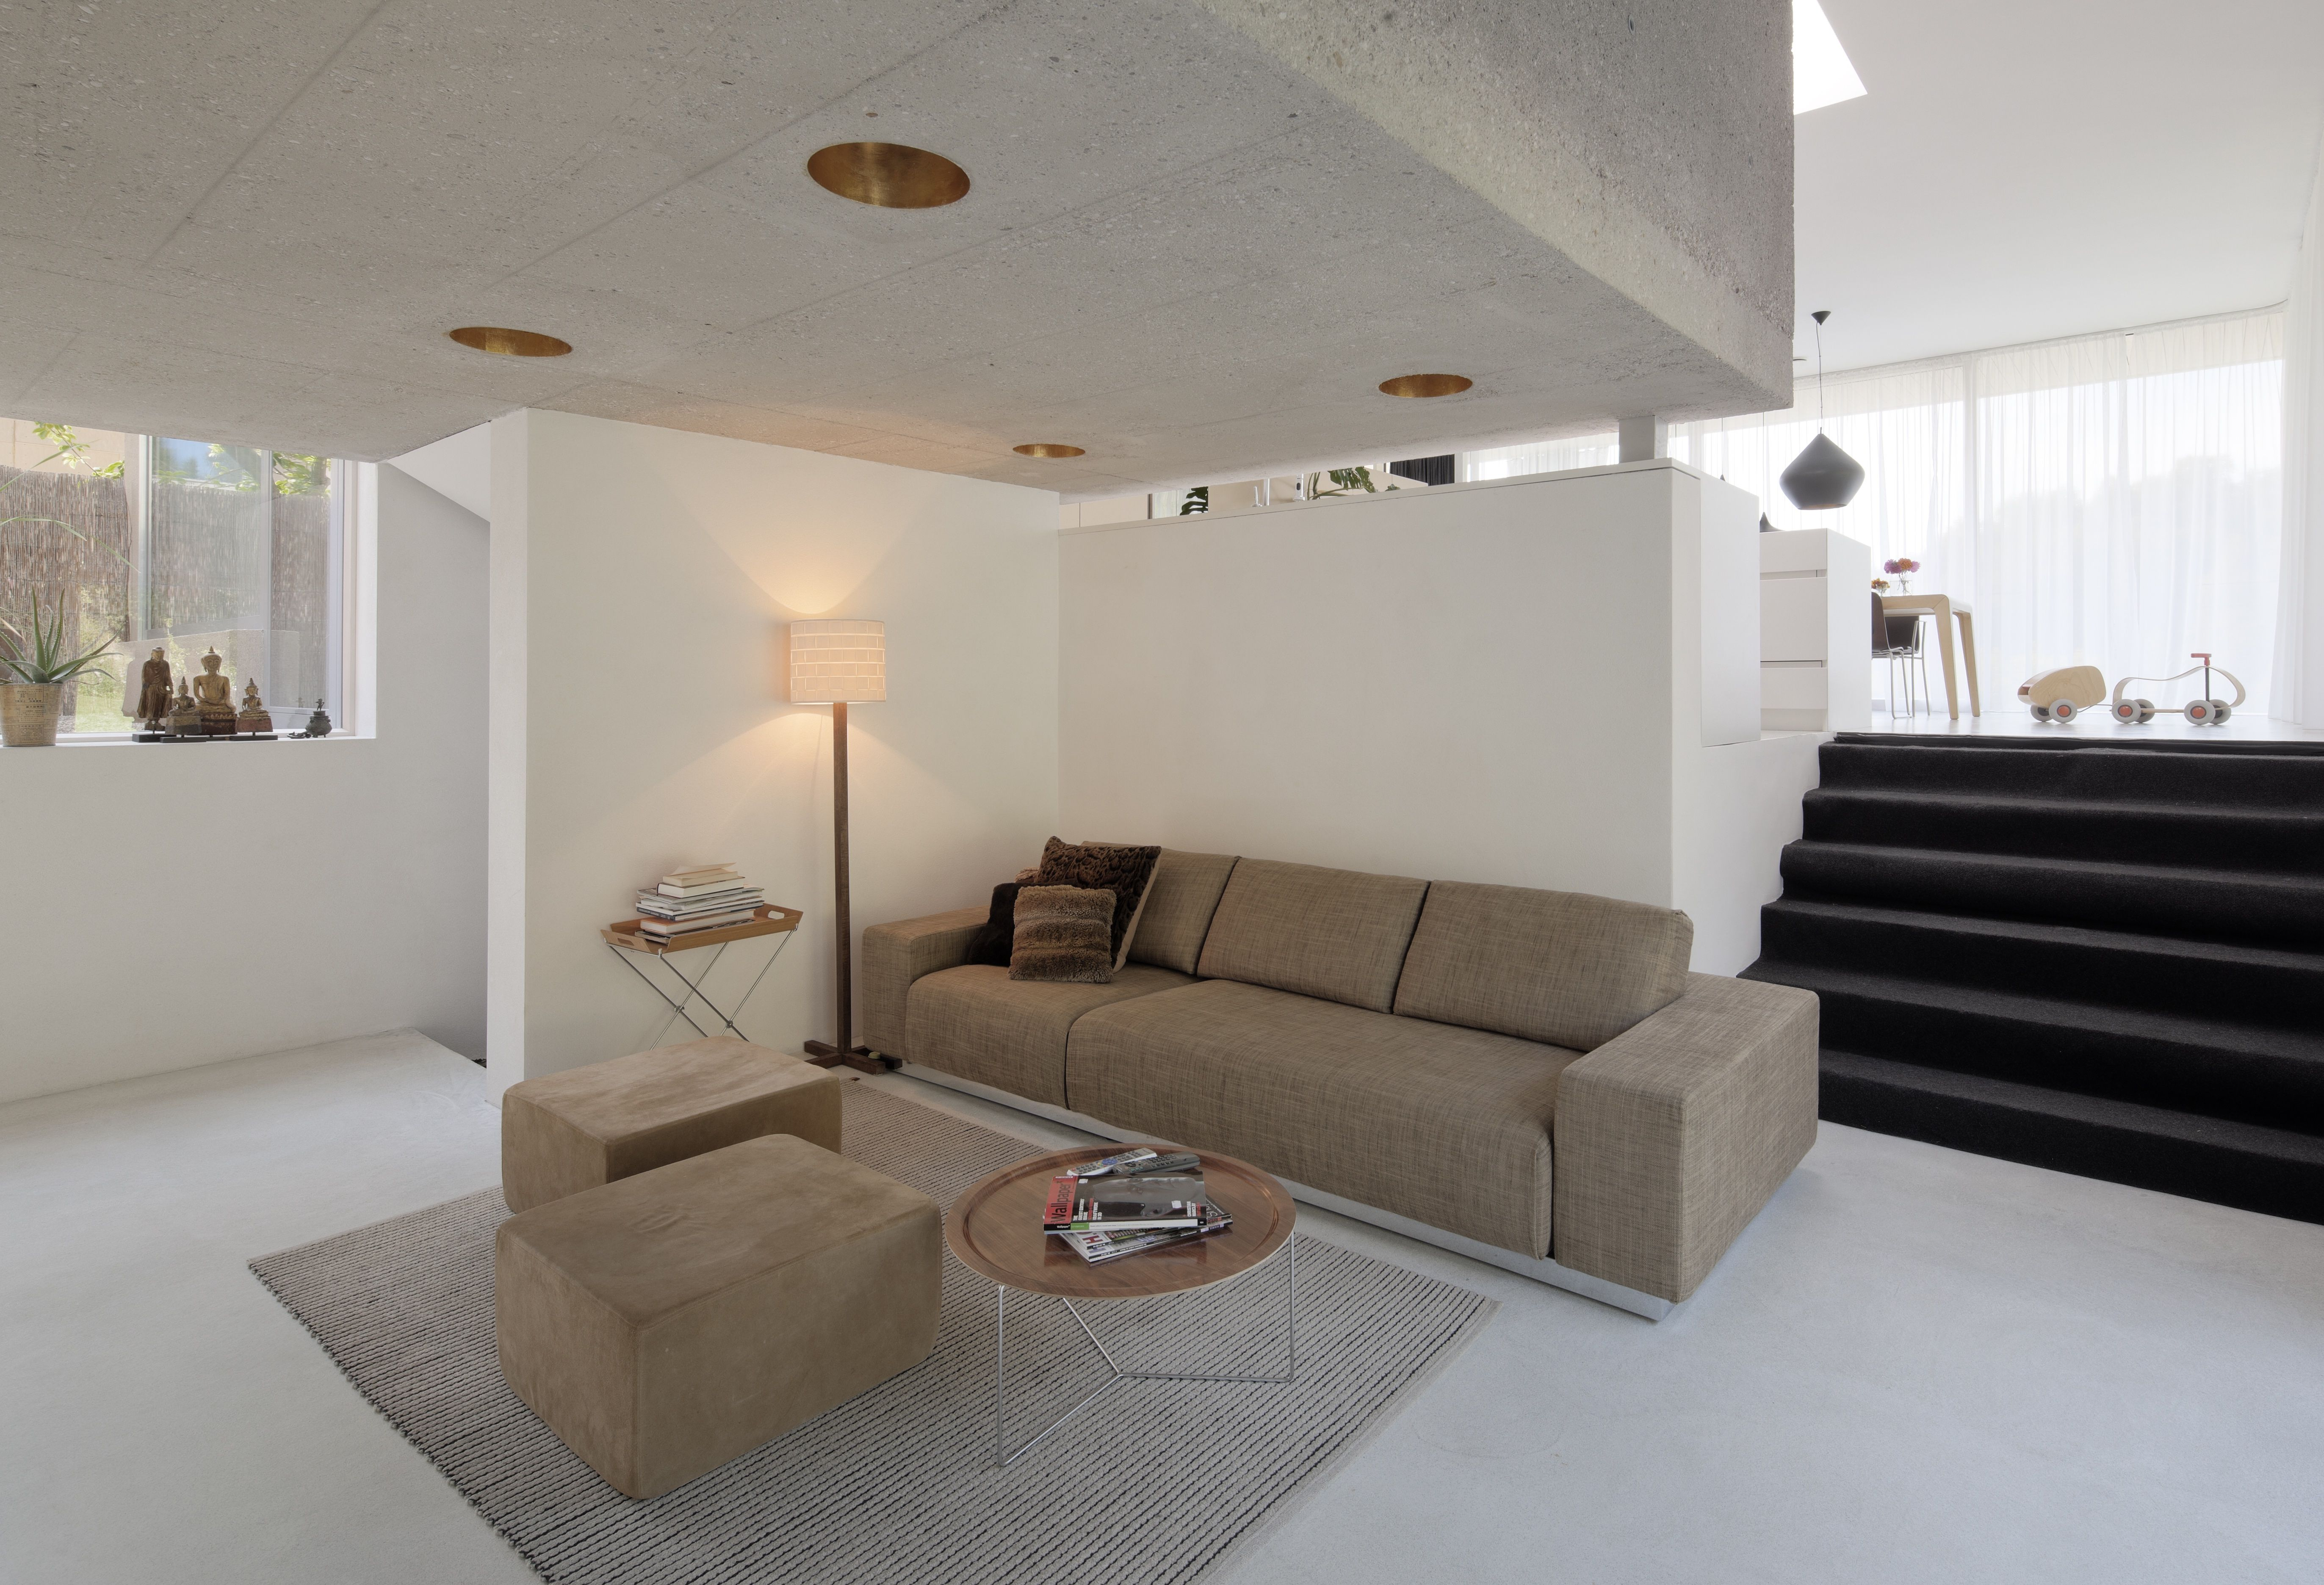 Home design bilder interieur pin by destilat on haus m  linz  pinterest  haus and interiors